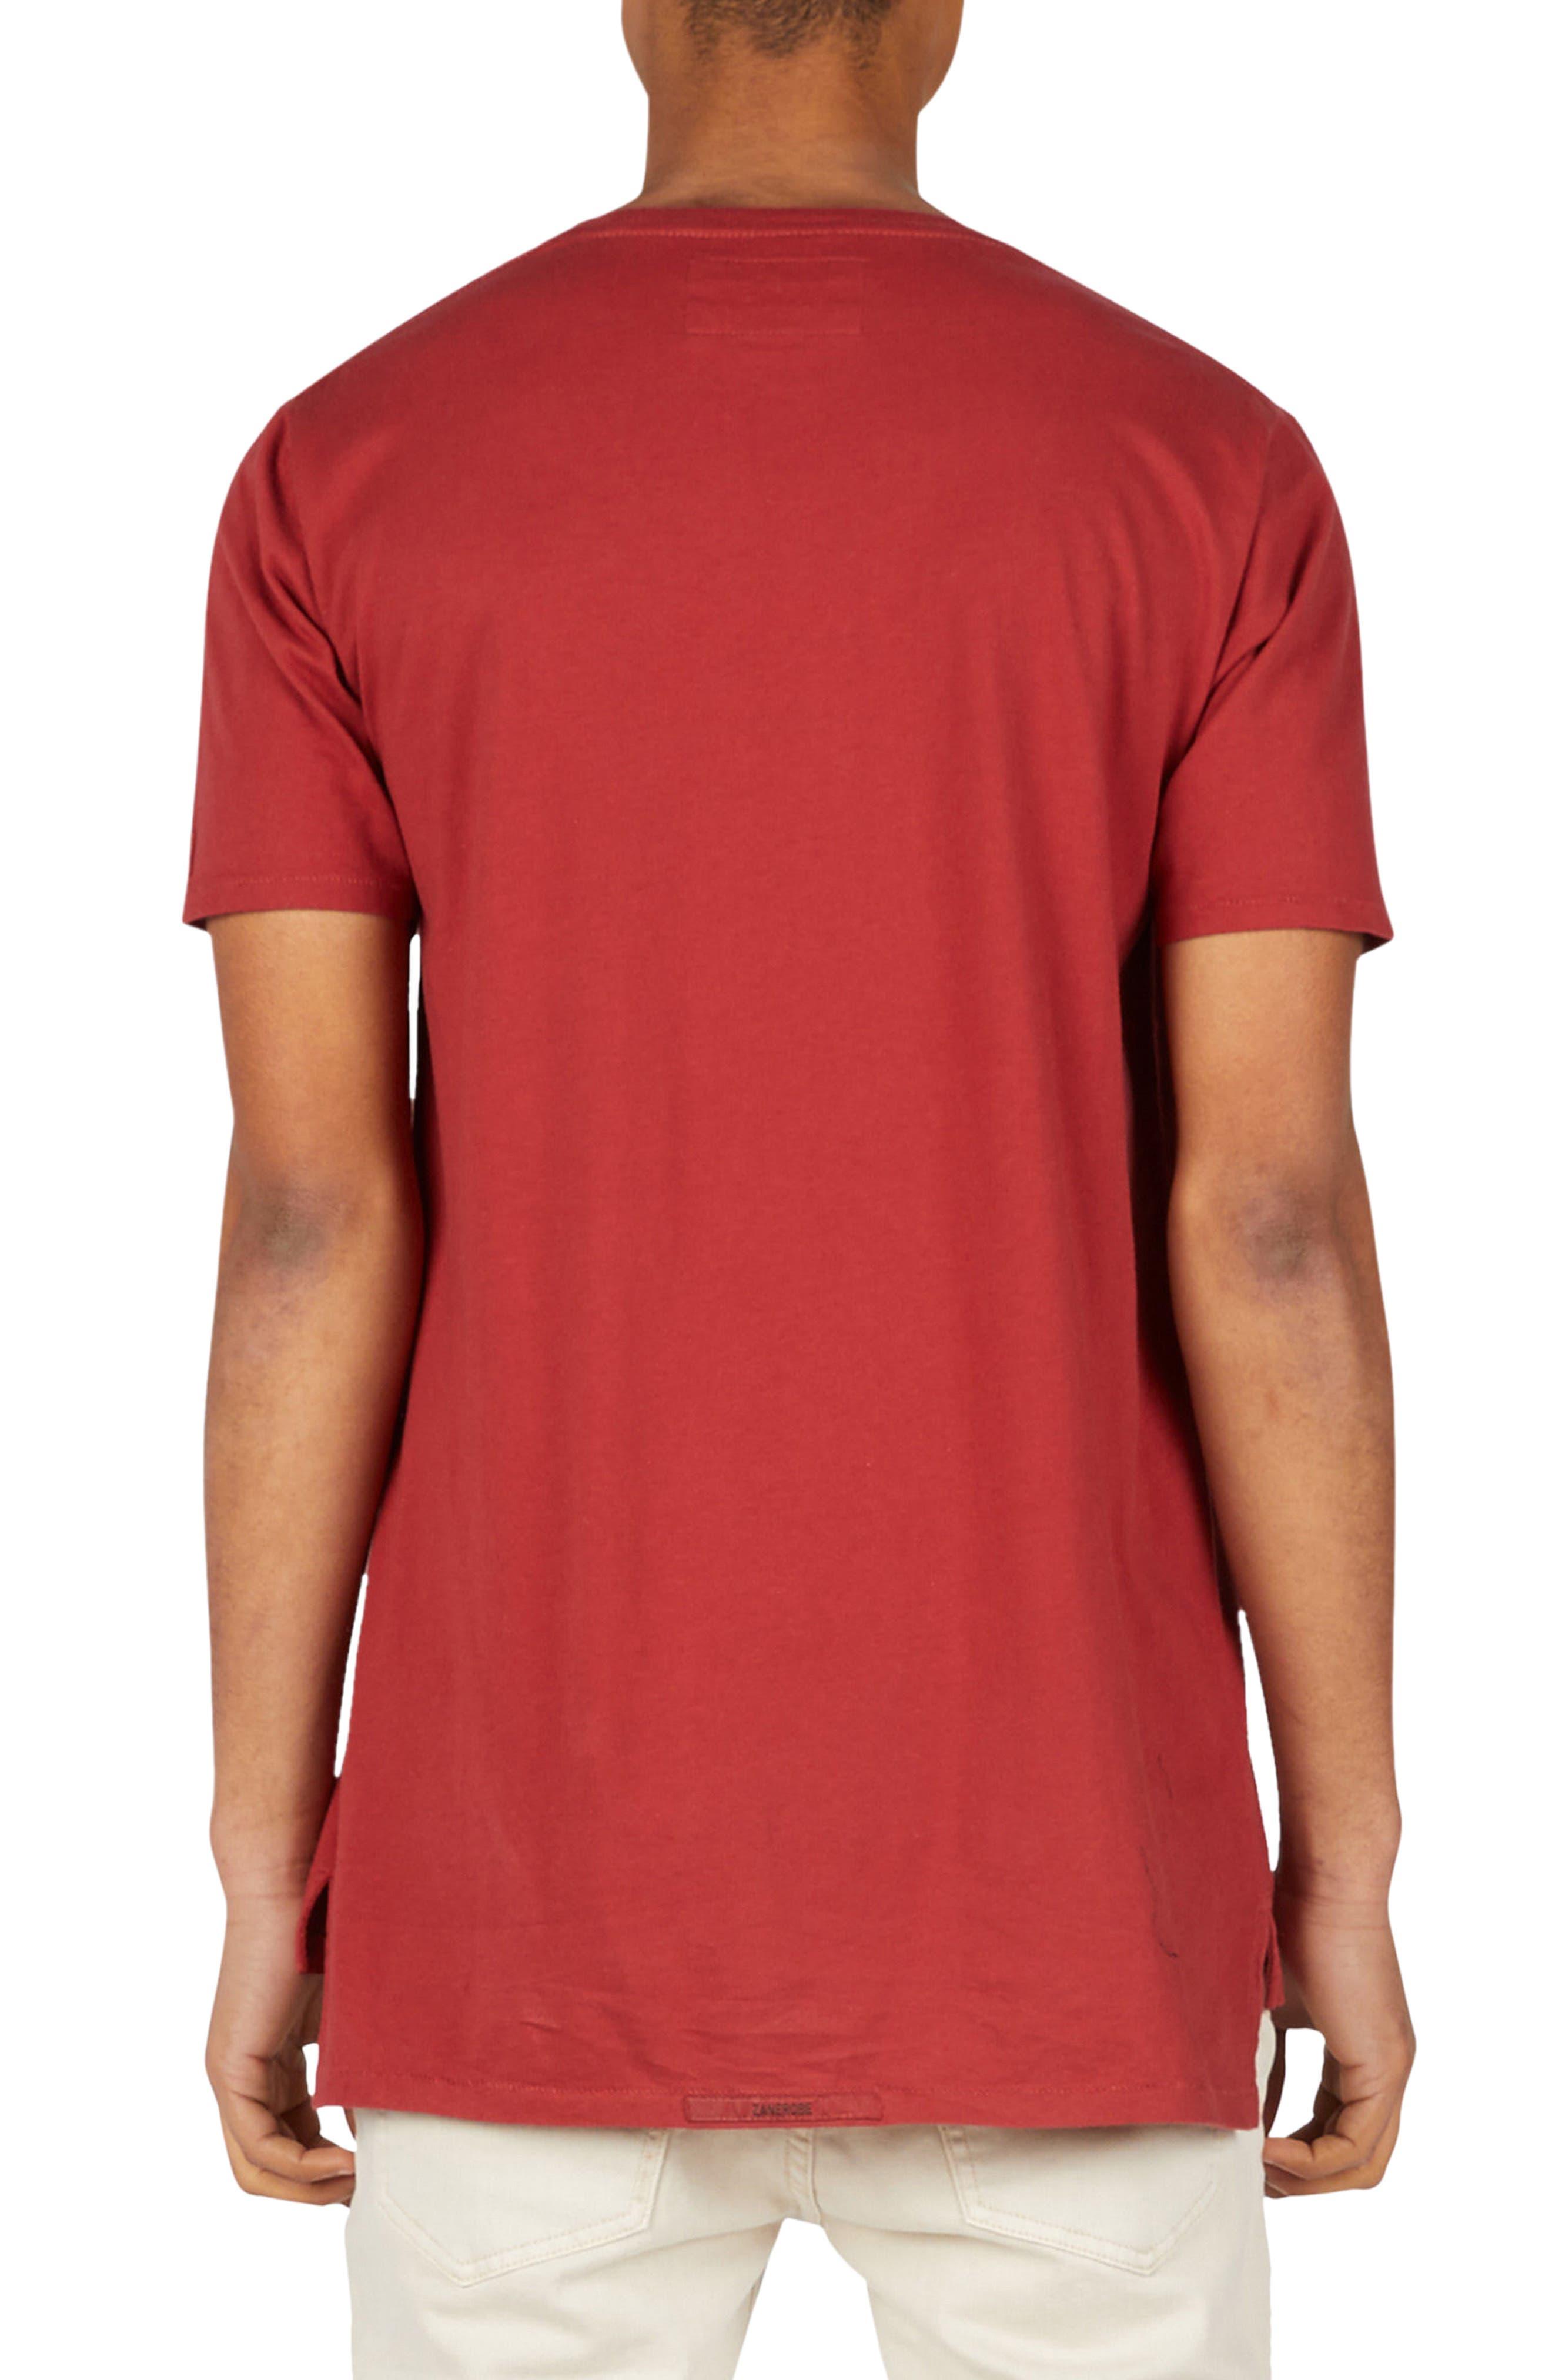 Flintlock T-Shirt,                             Alternate thumbnail 2, color,                             601